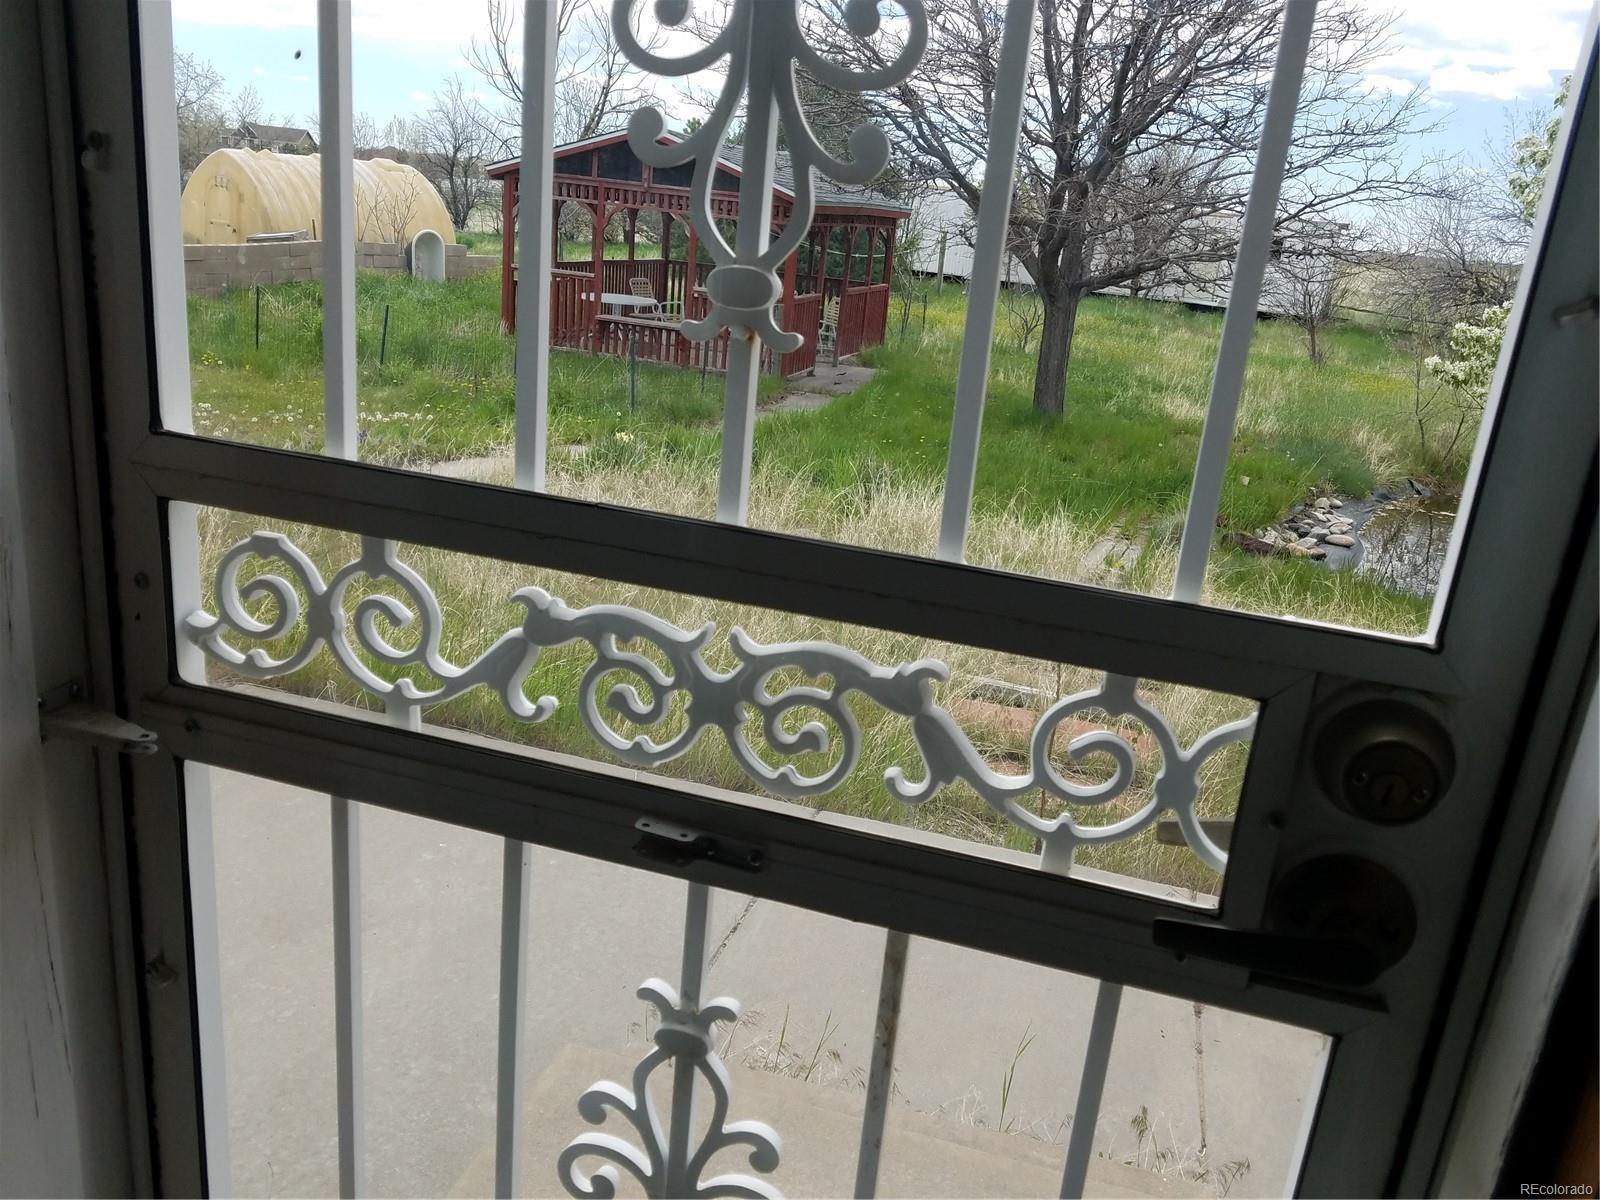 SECURITY DOORS AND WINDOWS